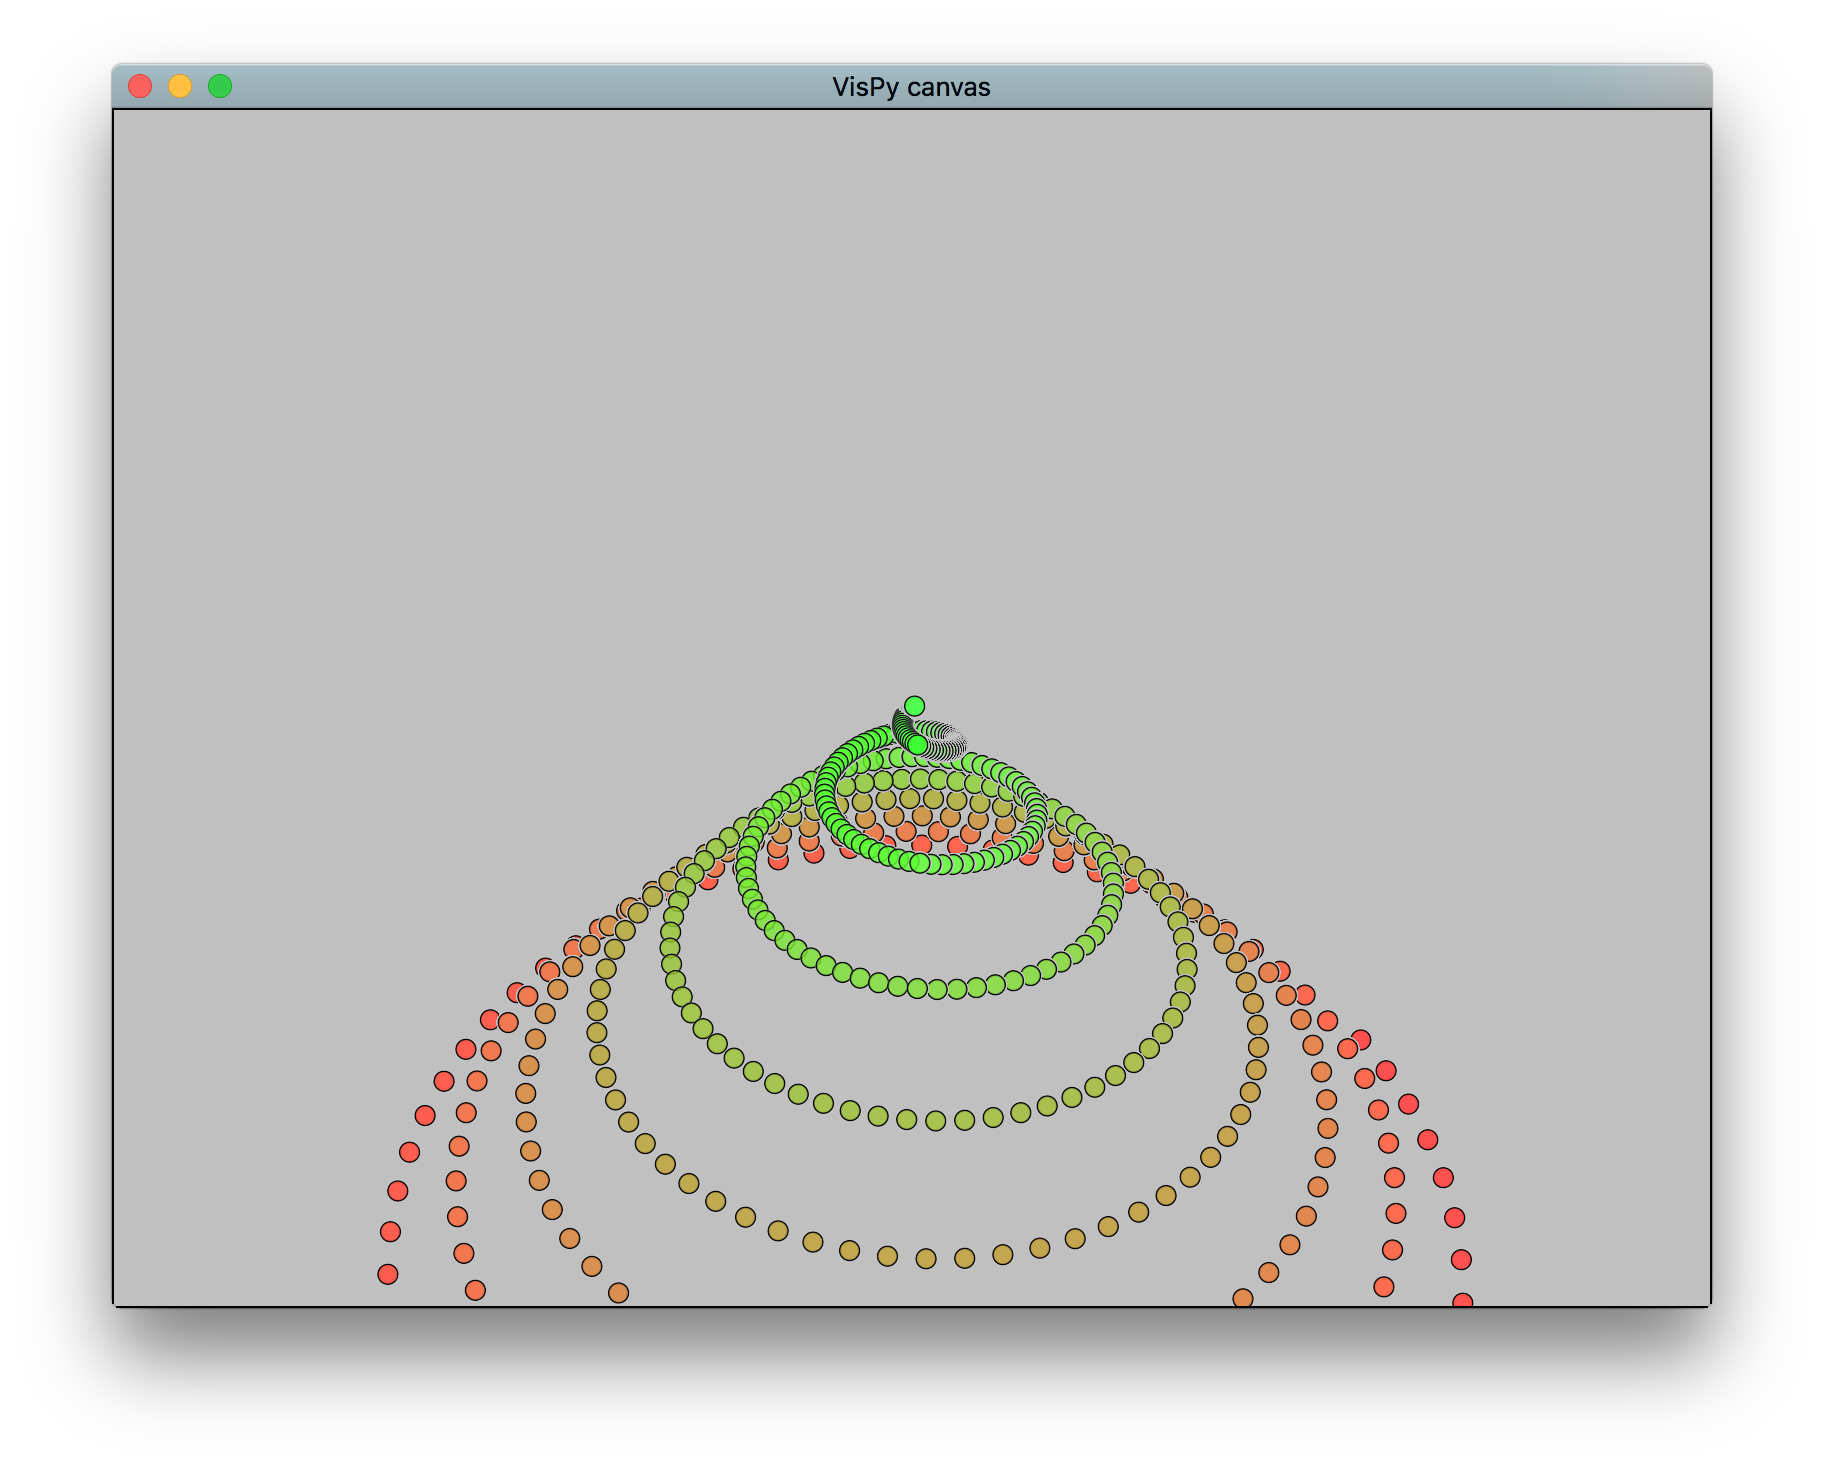 Translucent GL visuals with PyQt5 · Issue #1379 · vispy